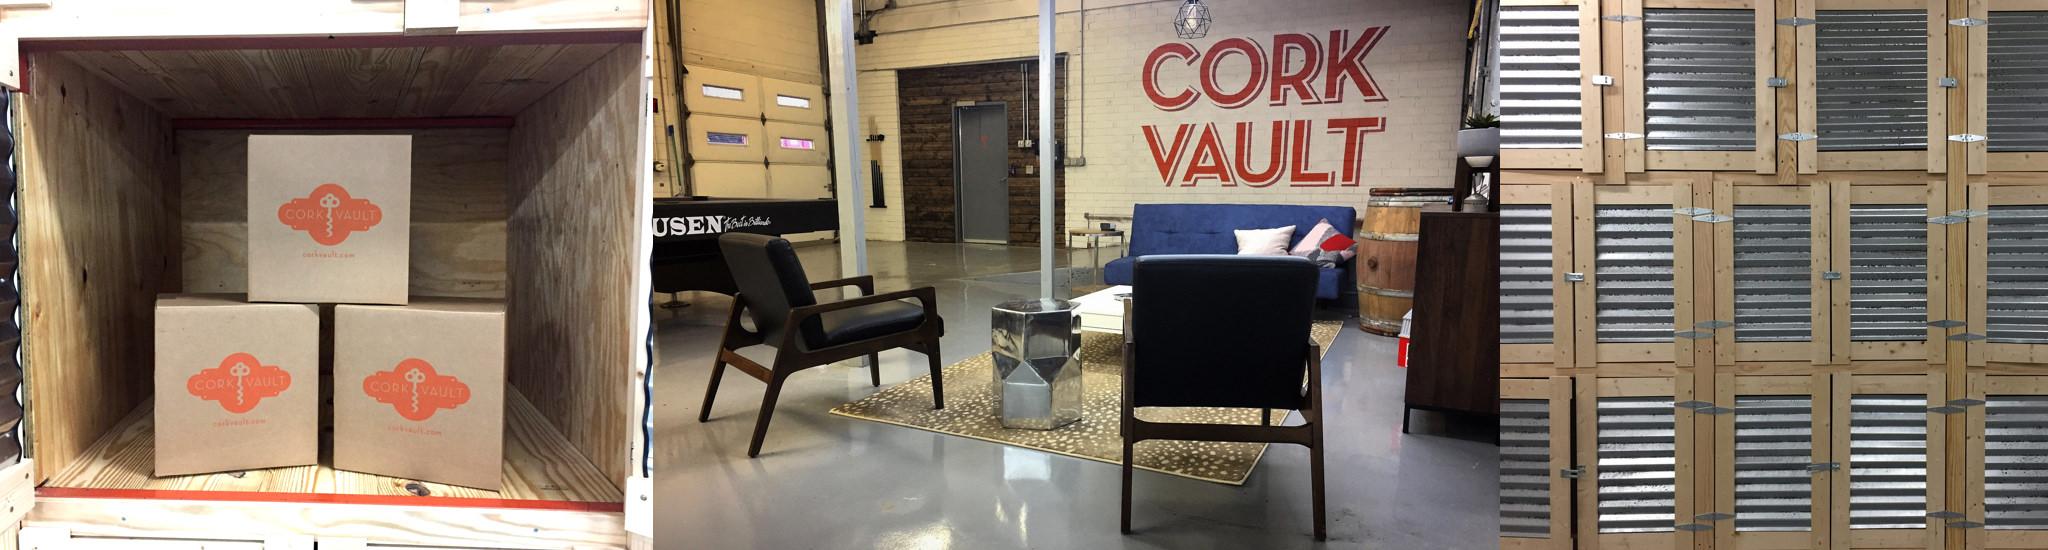 cork vault